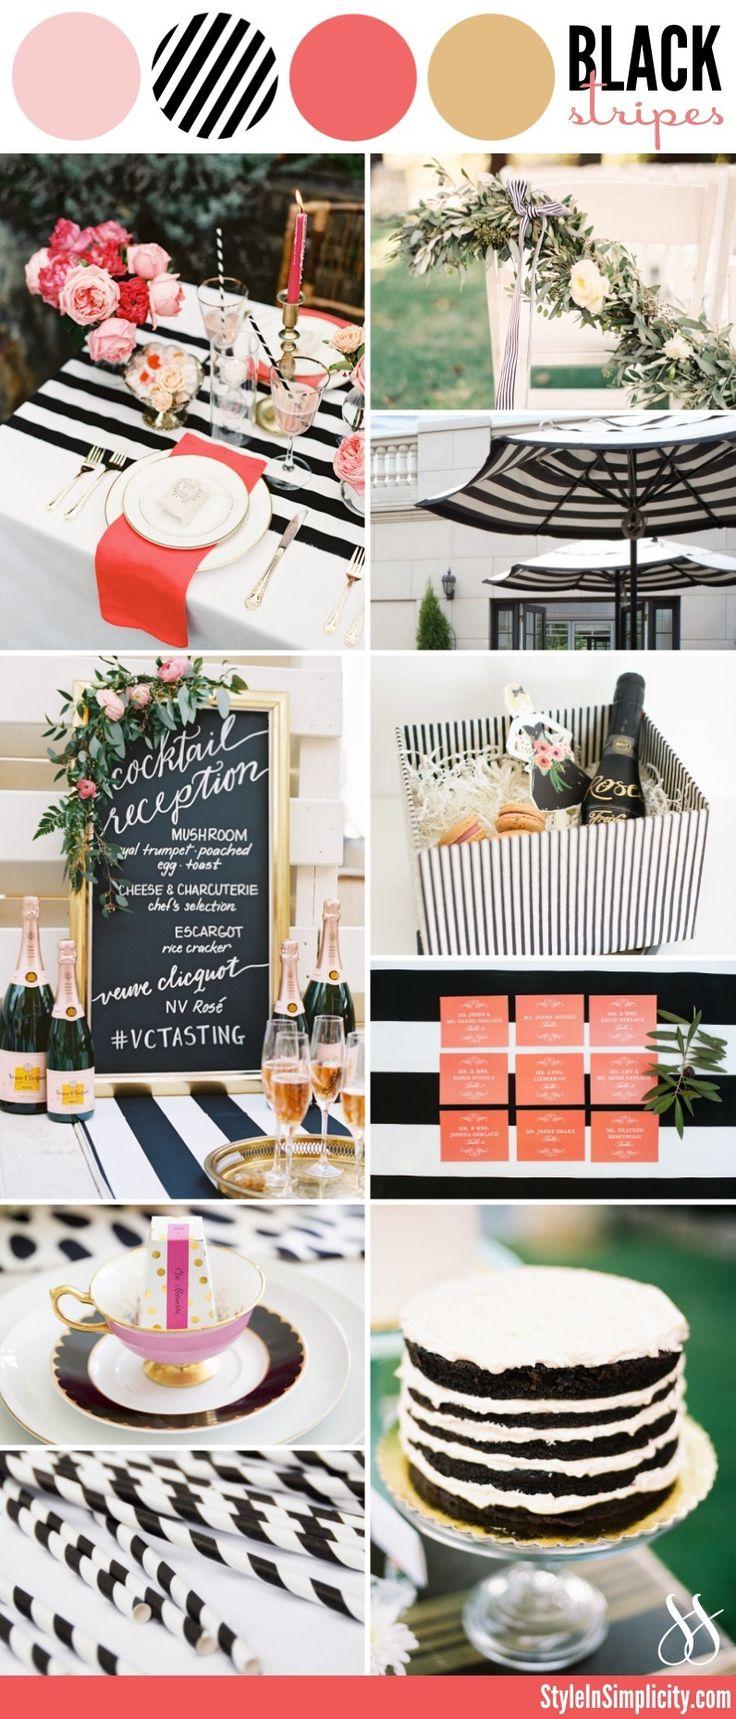 Modern Black &White Stripes - Wedding Color Palette Inspiration via StyleInSimplicity.com